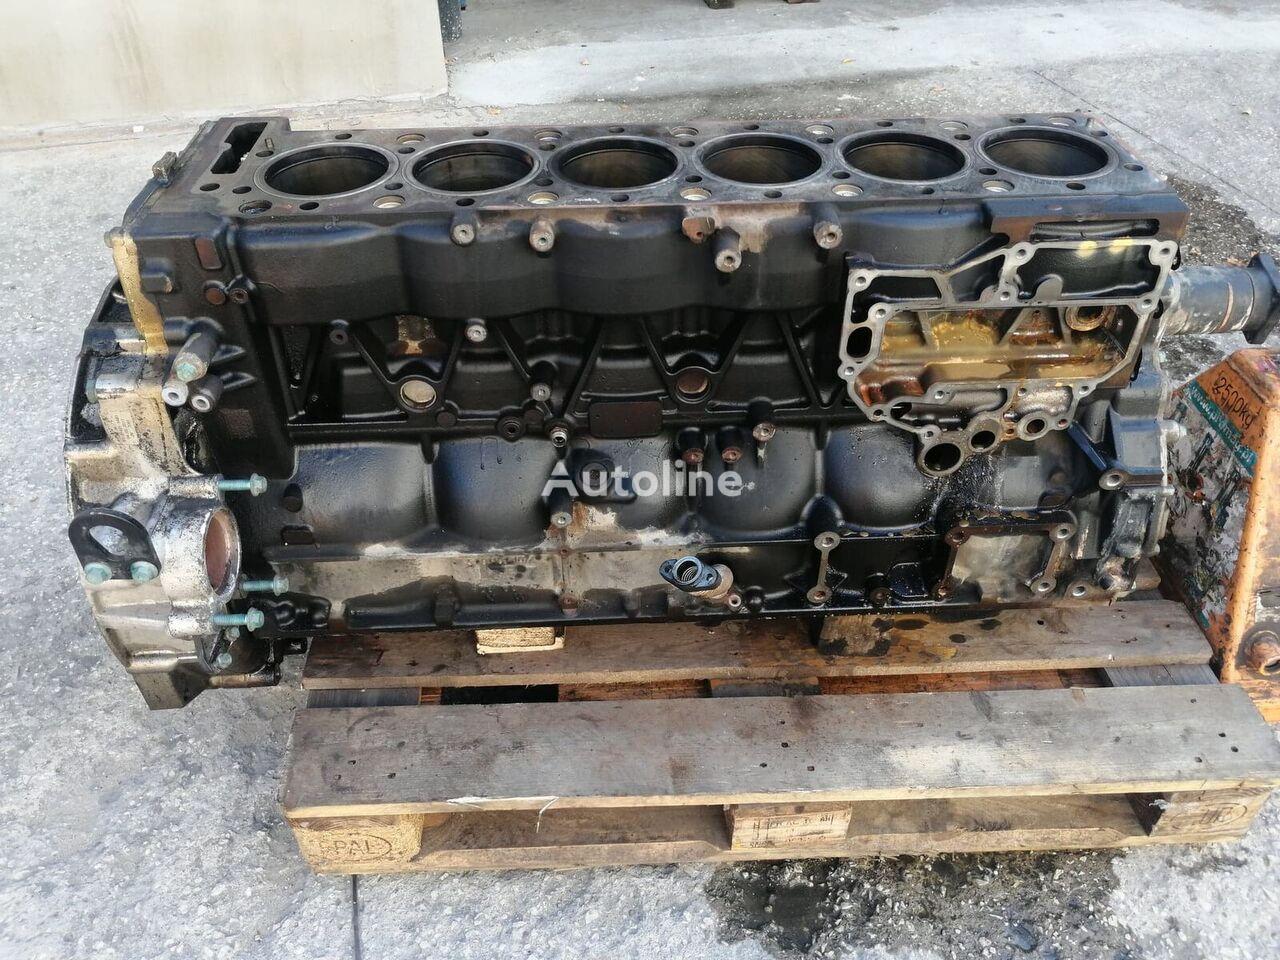 blocco cilindri MAN D2676LF52 Euro6 Nowy EURO 6 D2676 LF 52 Euro 6 per camion MAN TGX